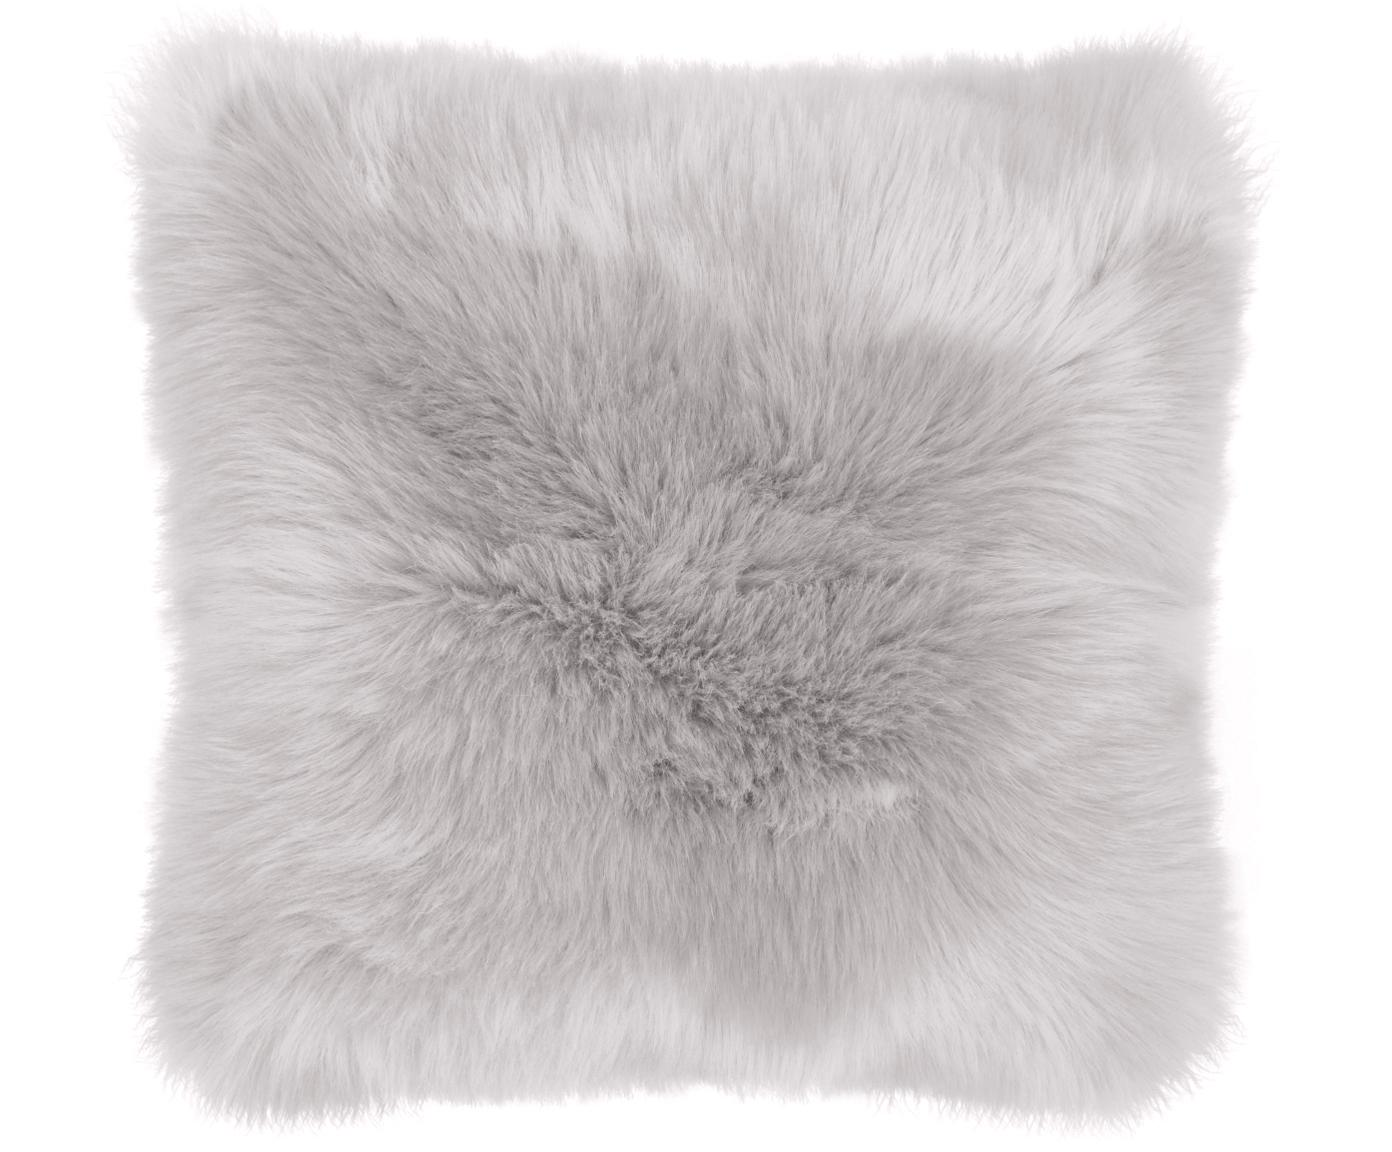 Flauschige Kunstfell-Kissenhülle Mathilde, glatt, Vorderseite: 67% Akryl, 33% Polyester, Rückseite: 100% Polyester, Hellgrau, 40 x 40 cm